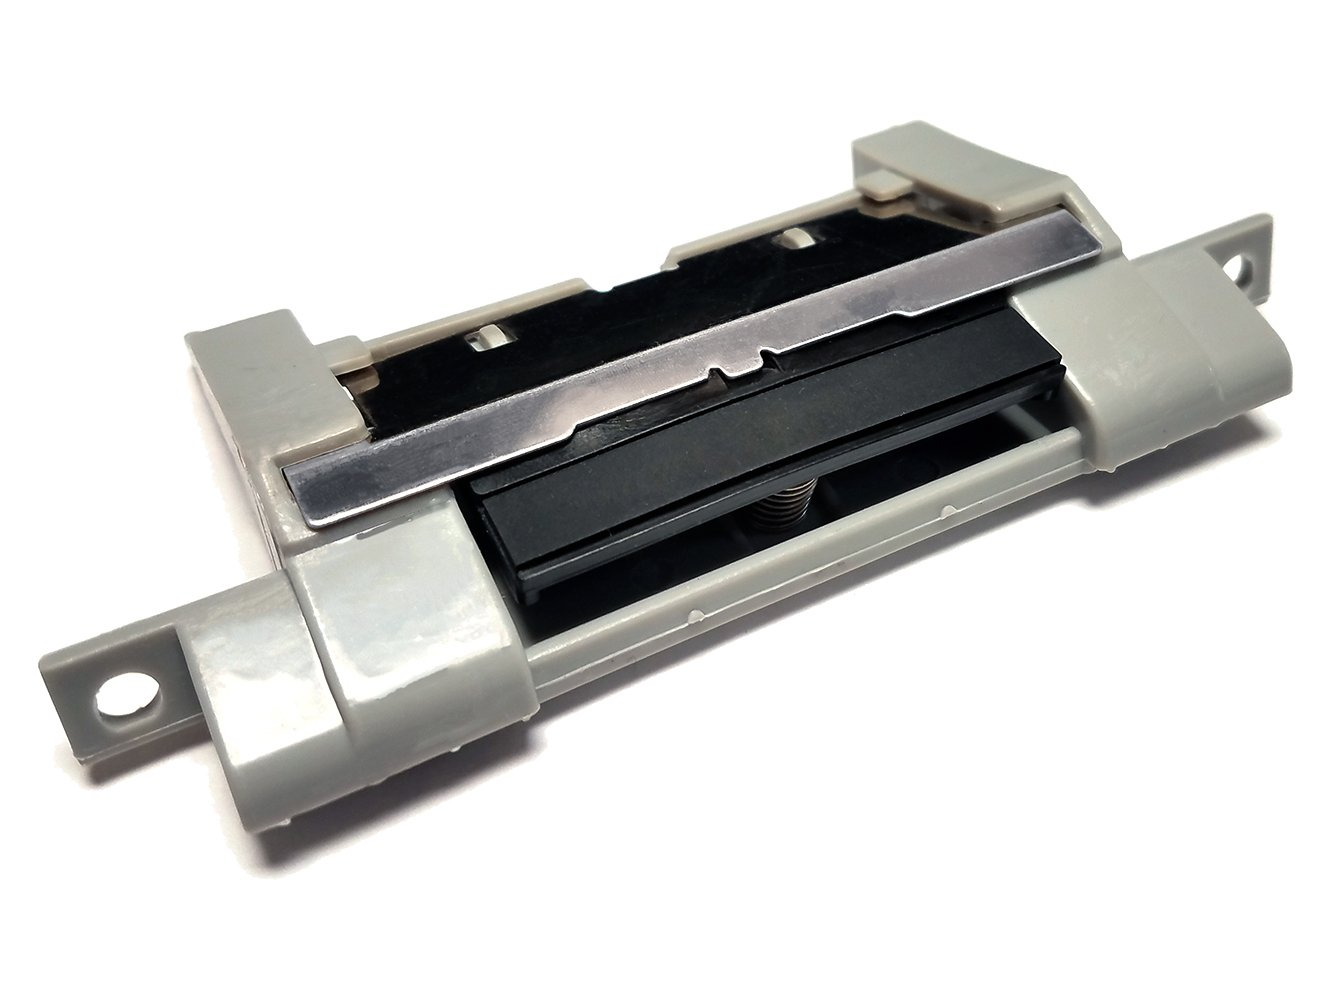 Transfer Roller /& Tray 1-2 Rollers 110V Altru Print Q7543-67909-MK-AP Includes RM1-2522 Fuser Q7543A. RM1-2522 Maintenance Kit for HP Laserjet 5200